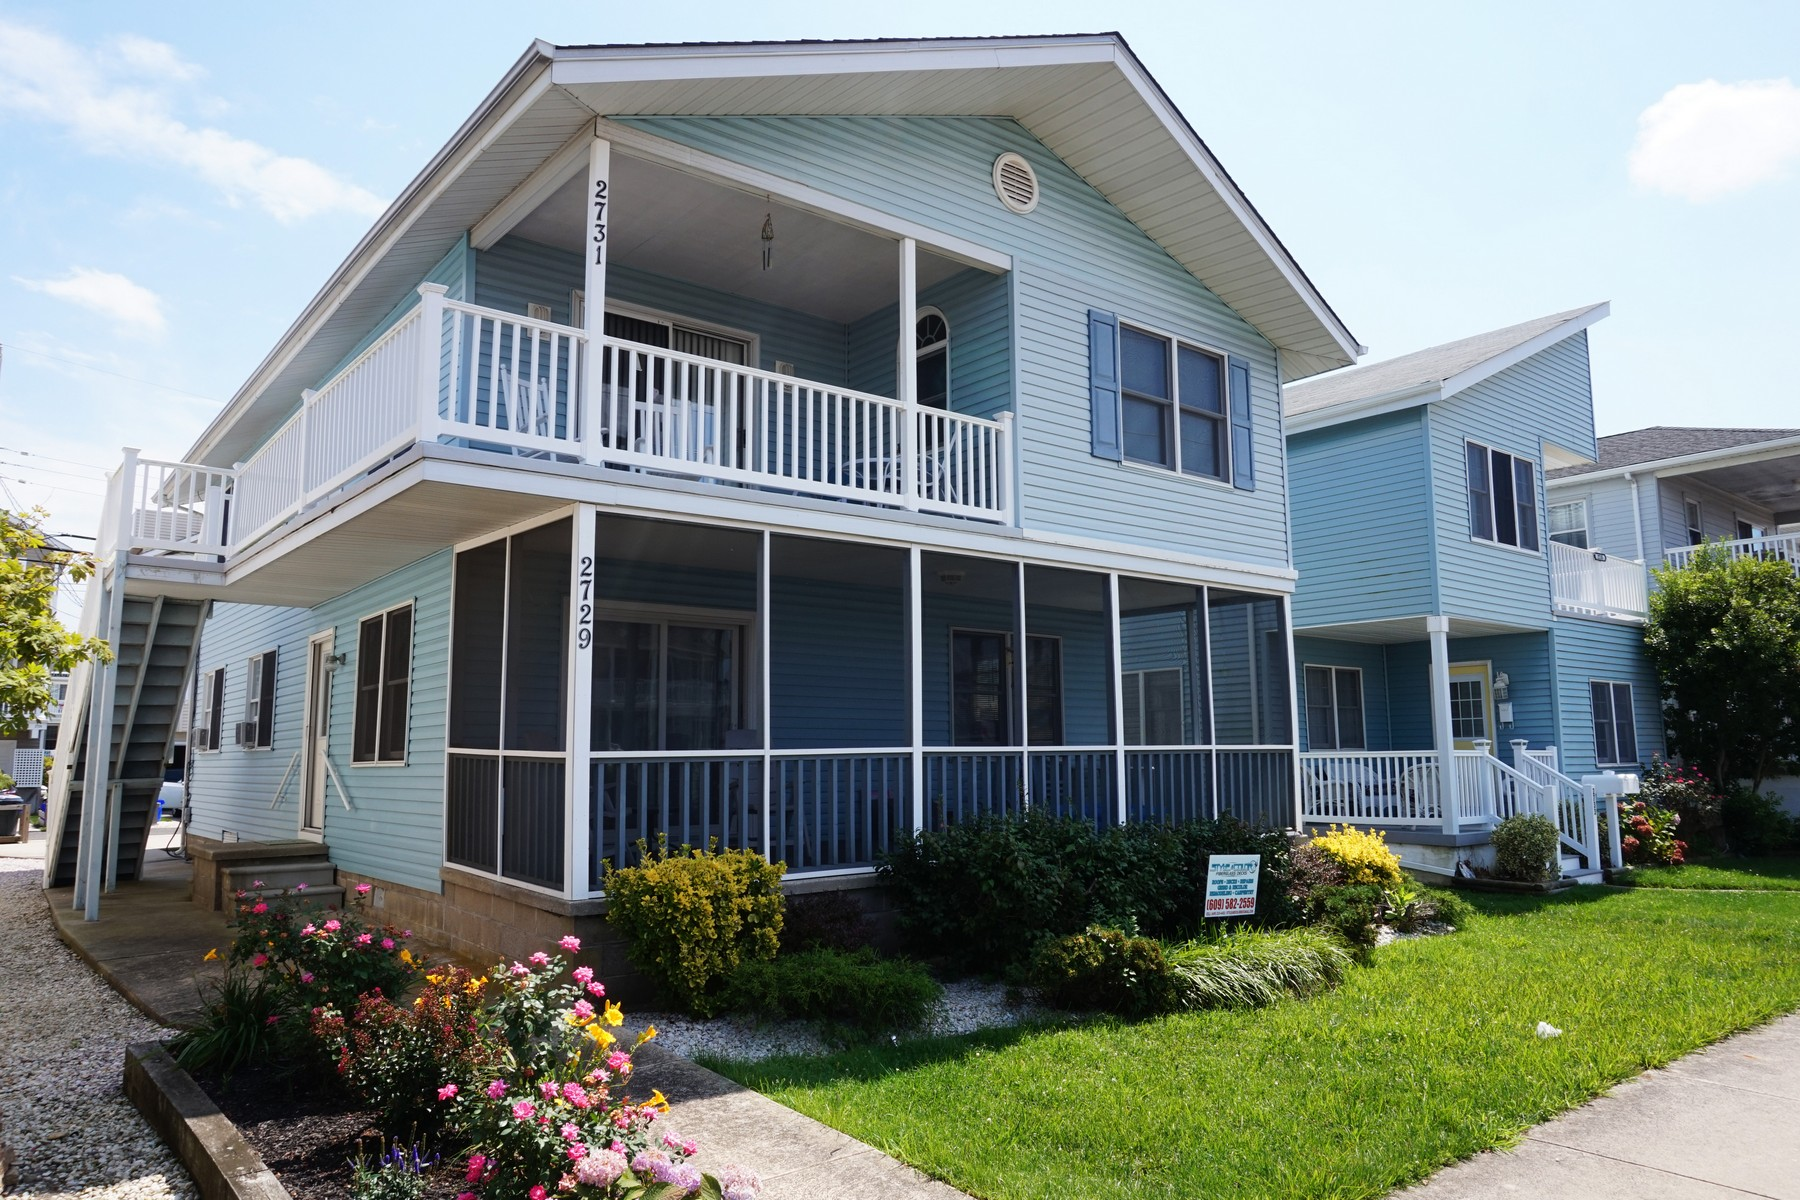 Condominium for Sale at West Avenue Condo 2731 West Avenue Ocean City, New Jersey 08226 United States